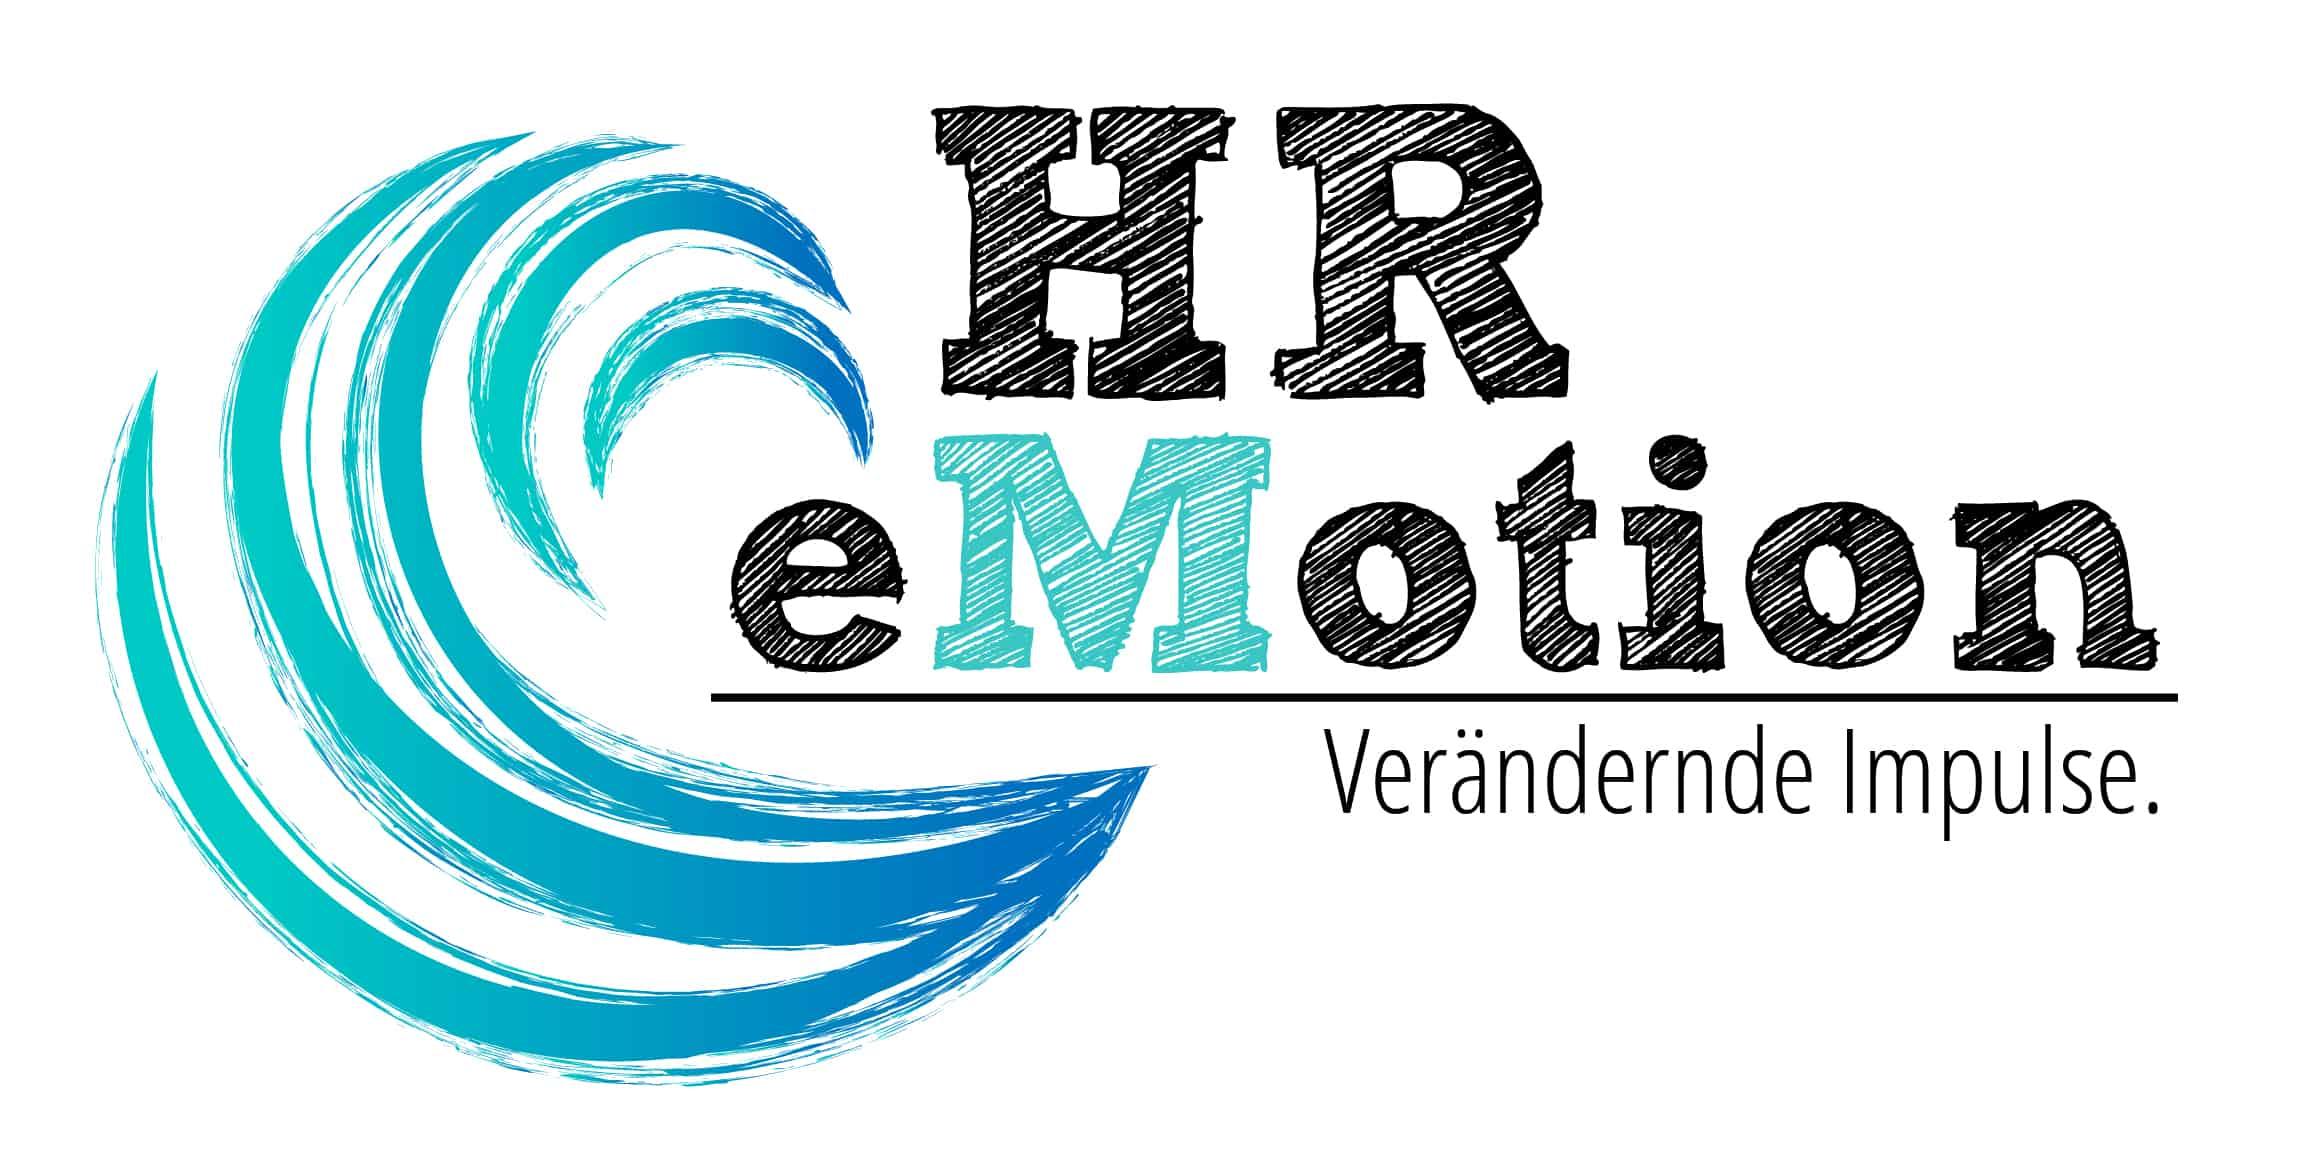 HR eMotion